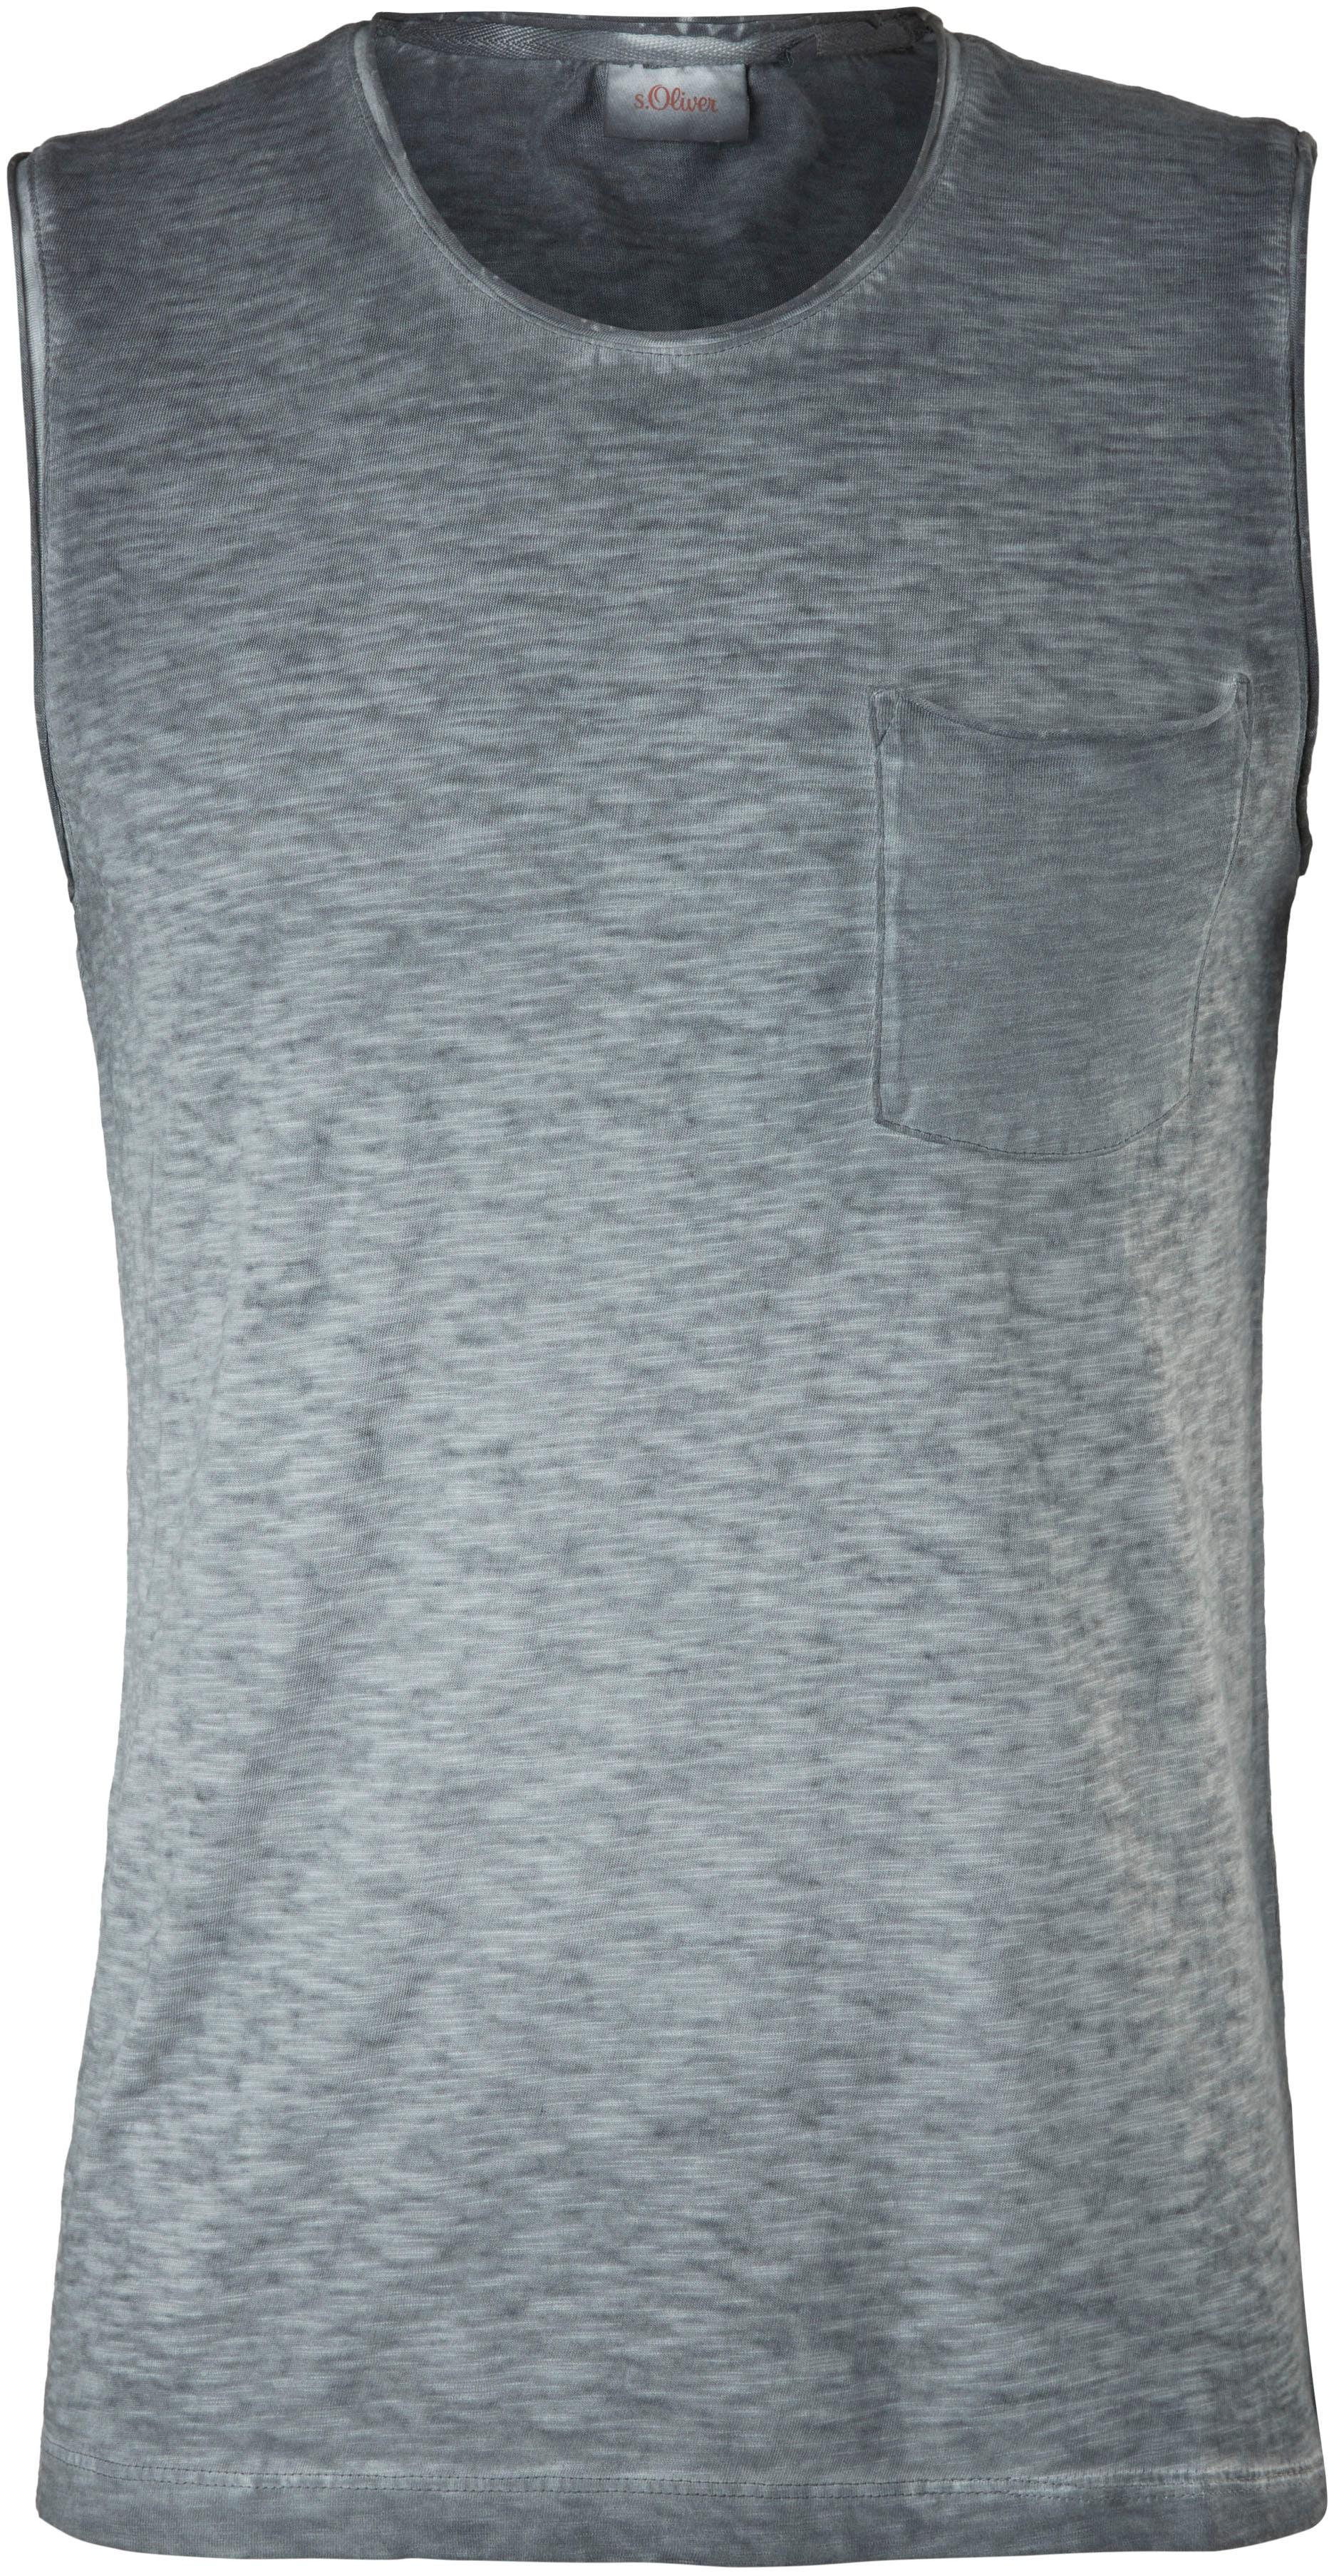 s.Oliver Muskelshirt, ohne Ärmel grau Herren Muskelshirts Shirts Muskelshirt